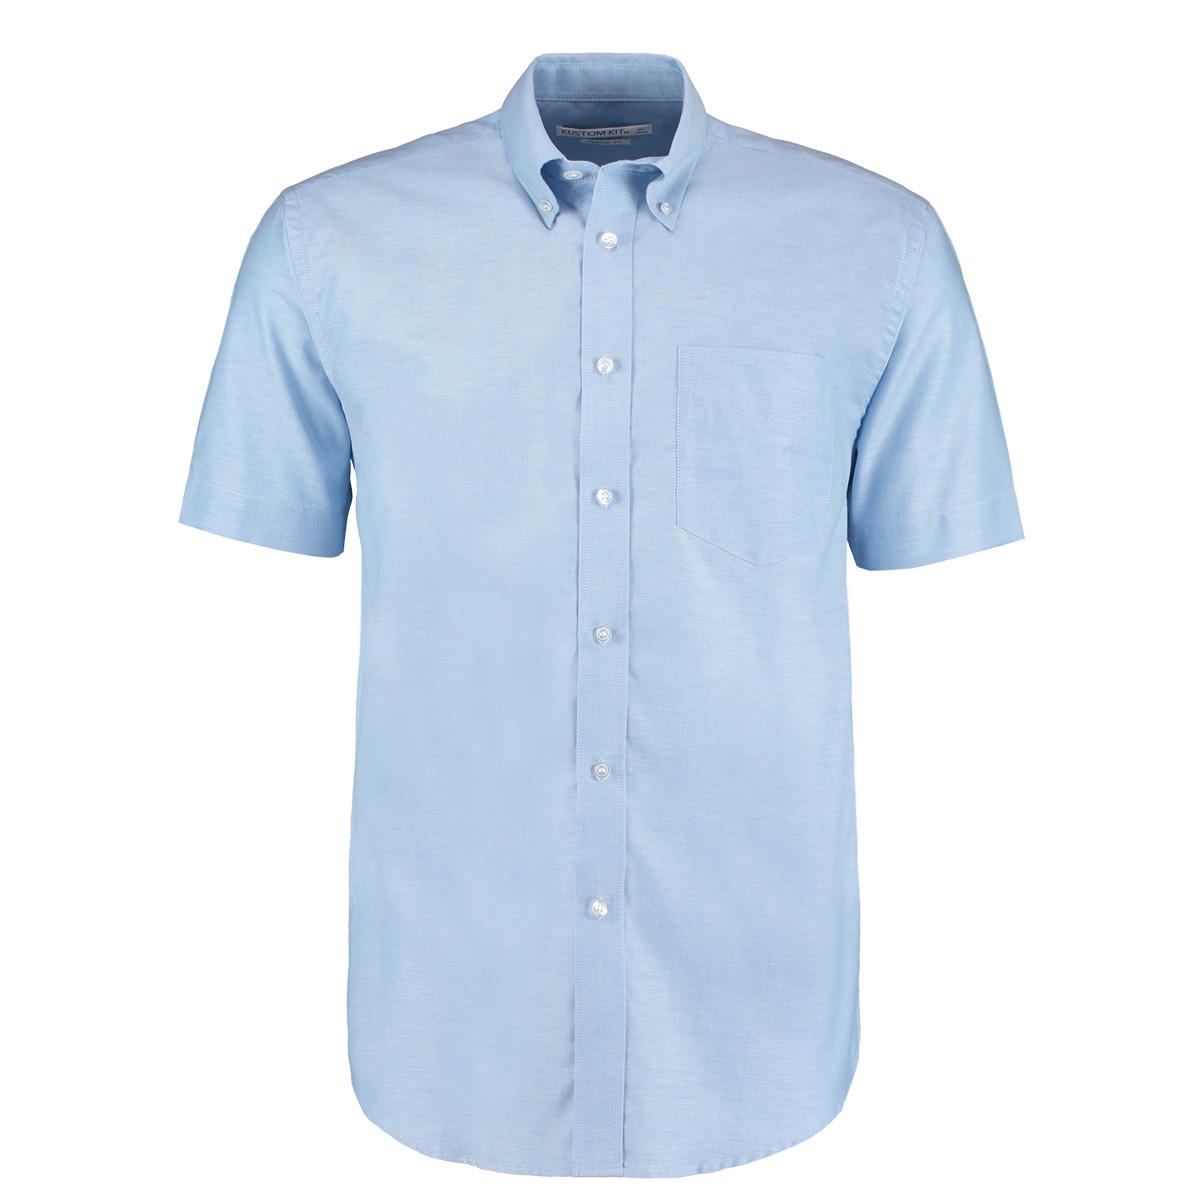 KK350 Workwear Oxford Shirt - Kustom Kit